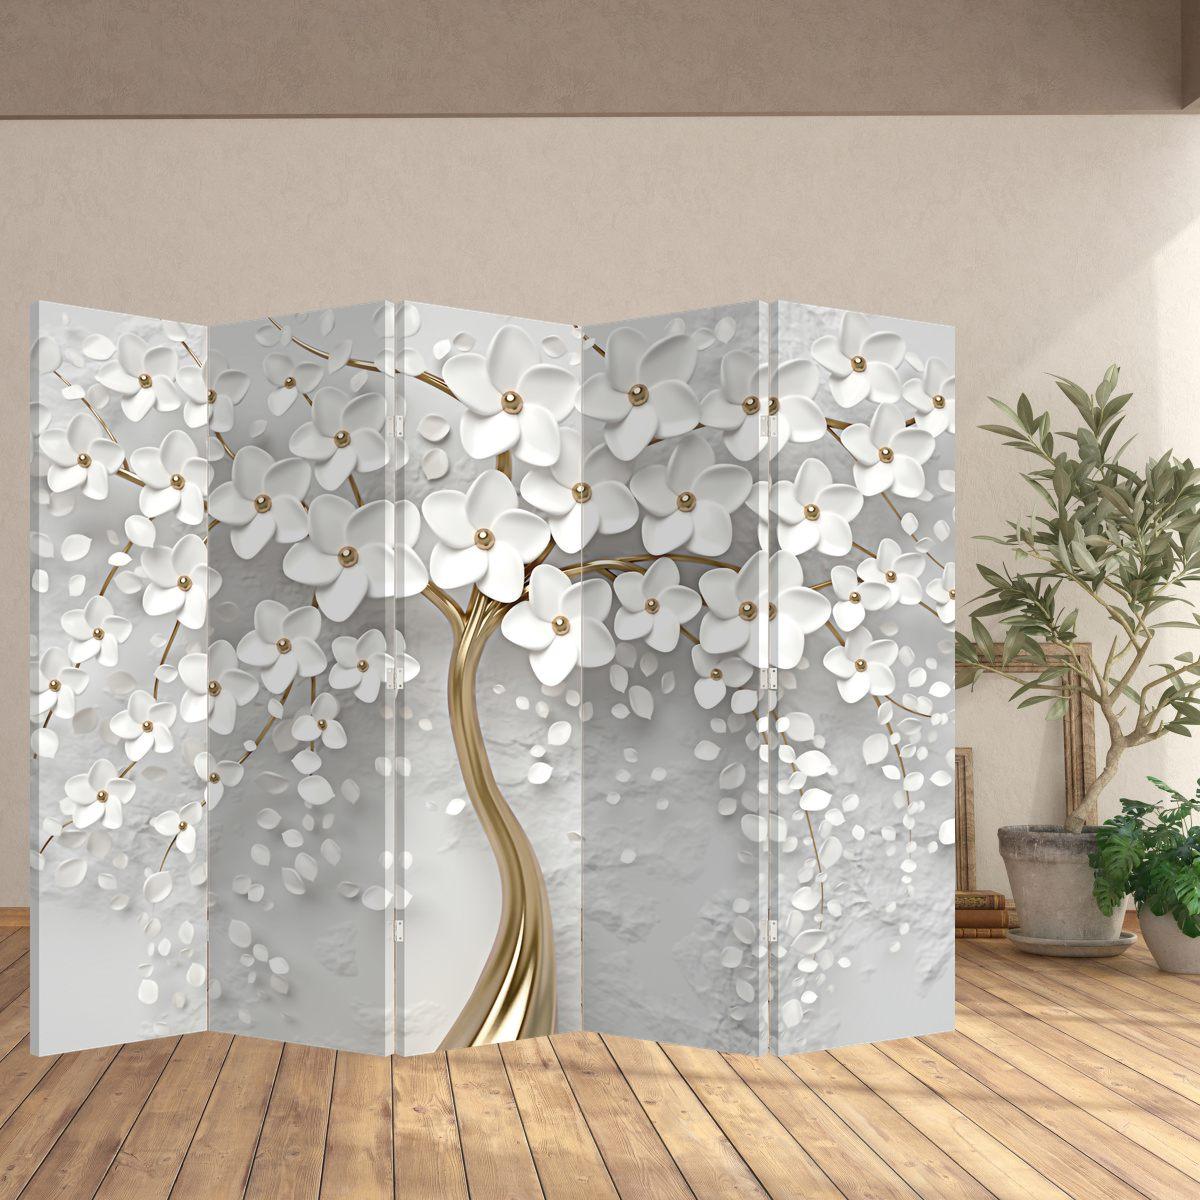 Paraván - Bílý strom s květinami (P020977P225180)